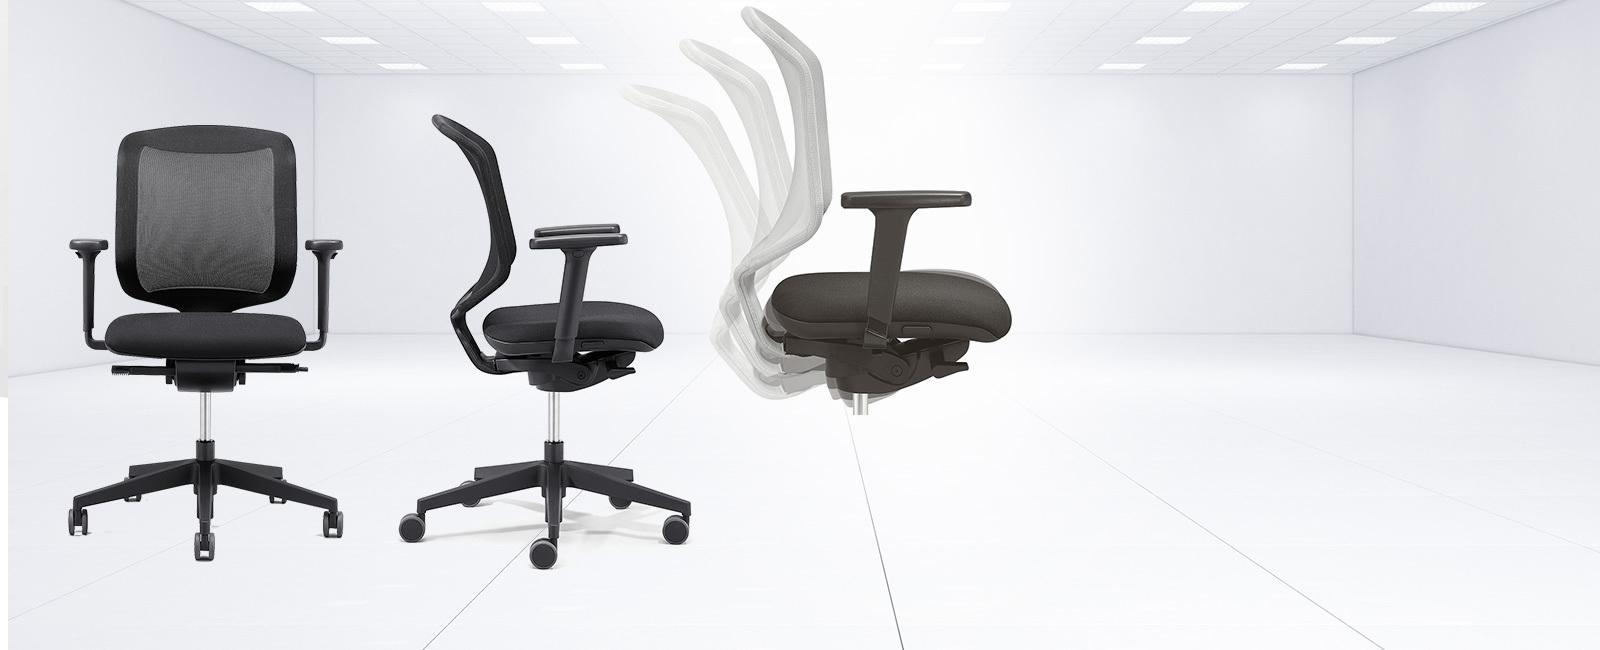 Qoqa Giroflex Arbeitsstuhle Fur Zuhause 434 Chair 2 Go